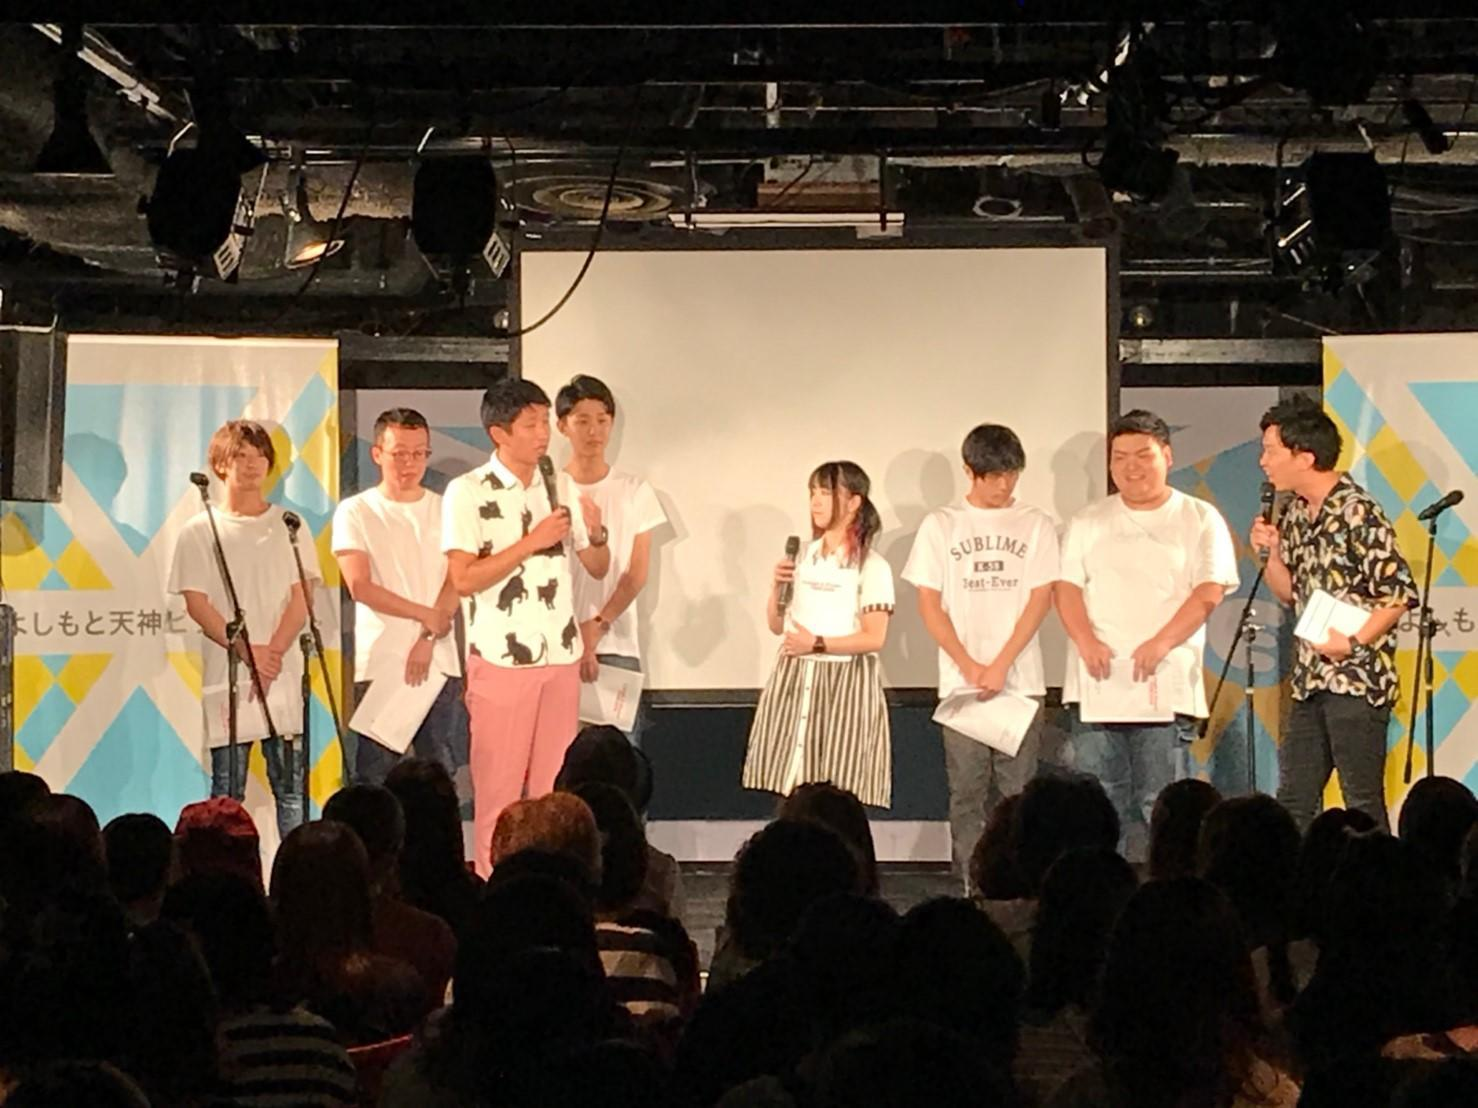 http://news.yoshimoto.co.jp/20181006174933-160a08cefe226e637b48e4361435082e3138c2ba.jpg